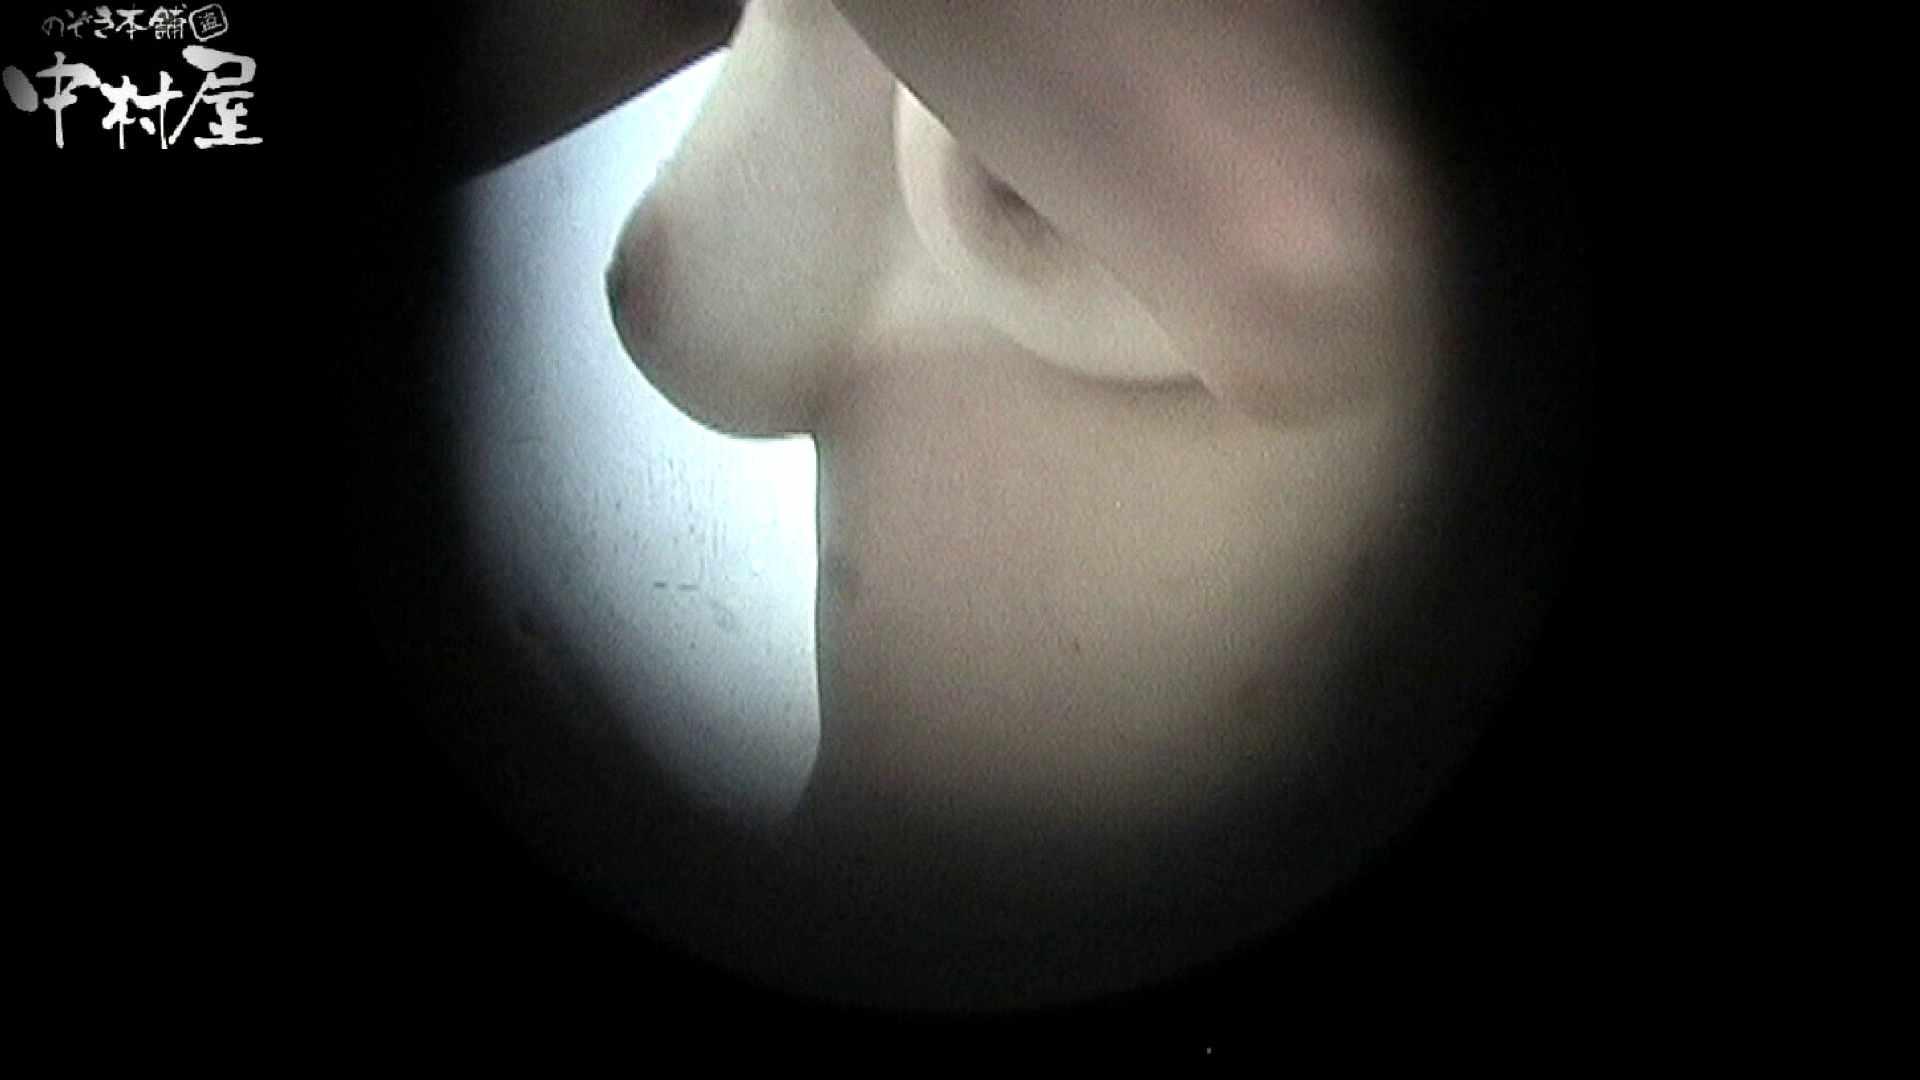 No.46 マシュマロ巨乳が目の前でプルプル 接写   巨乳編  108PIX 53